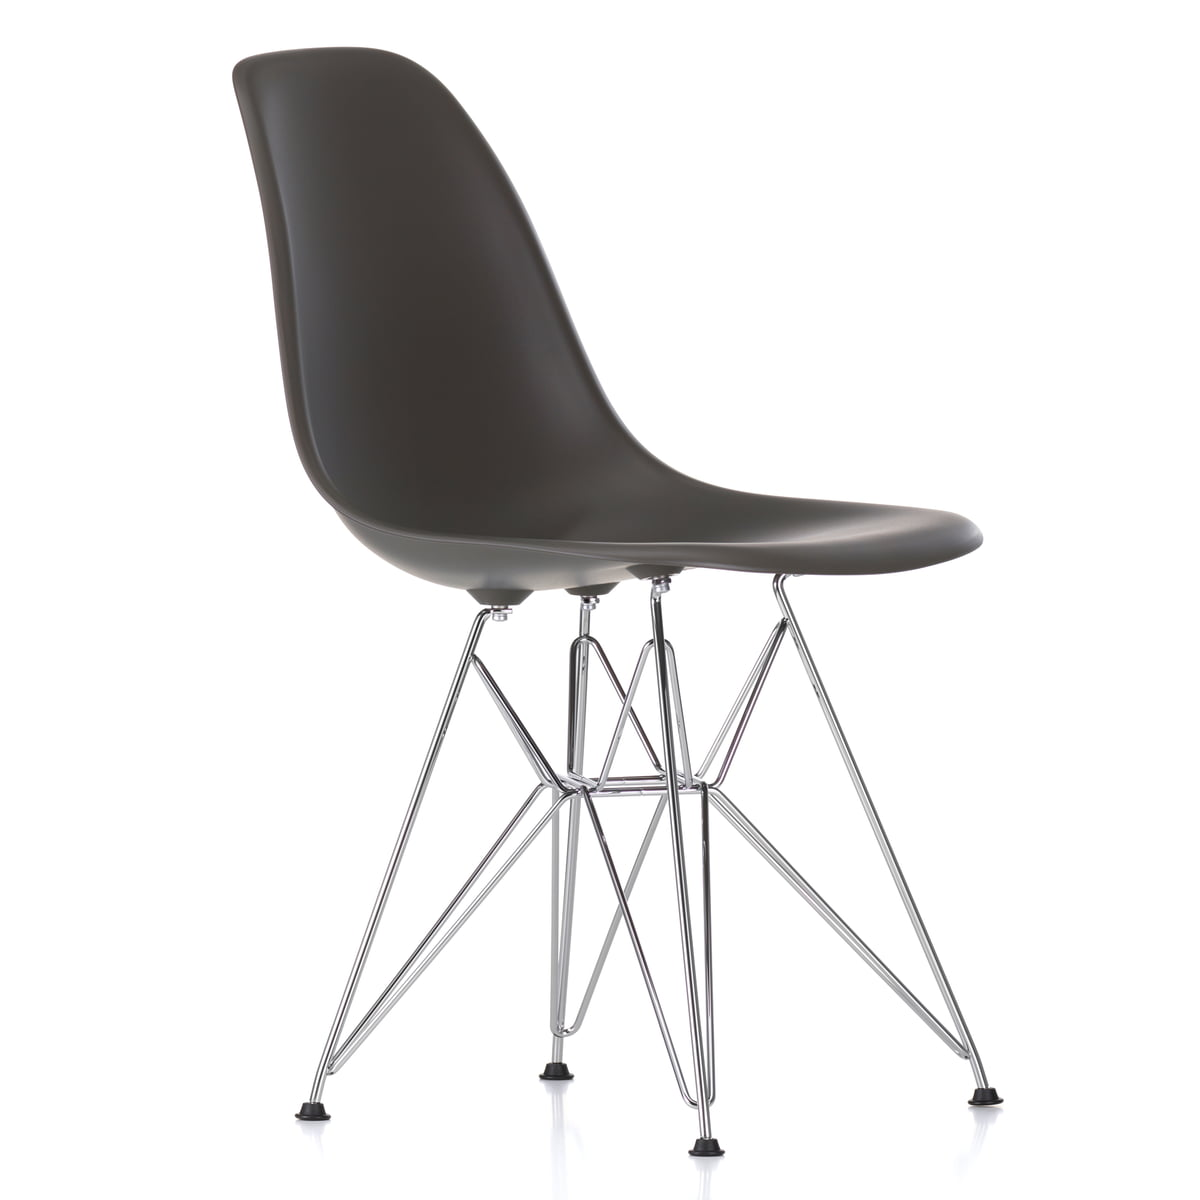 Vitra Chaise Chaise Eames Plastic Side DSR, chromé basalte (patin plastique basic dark)